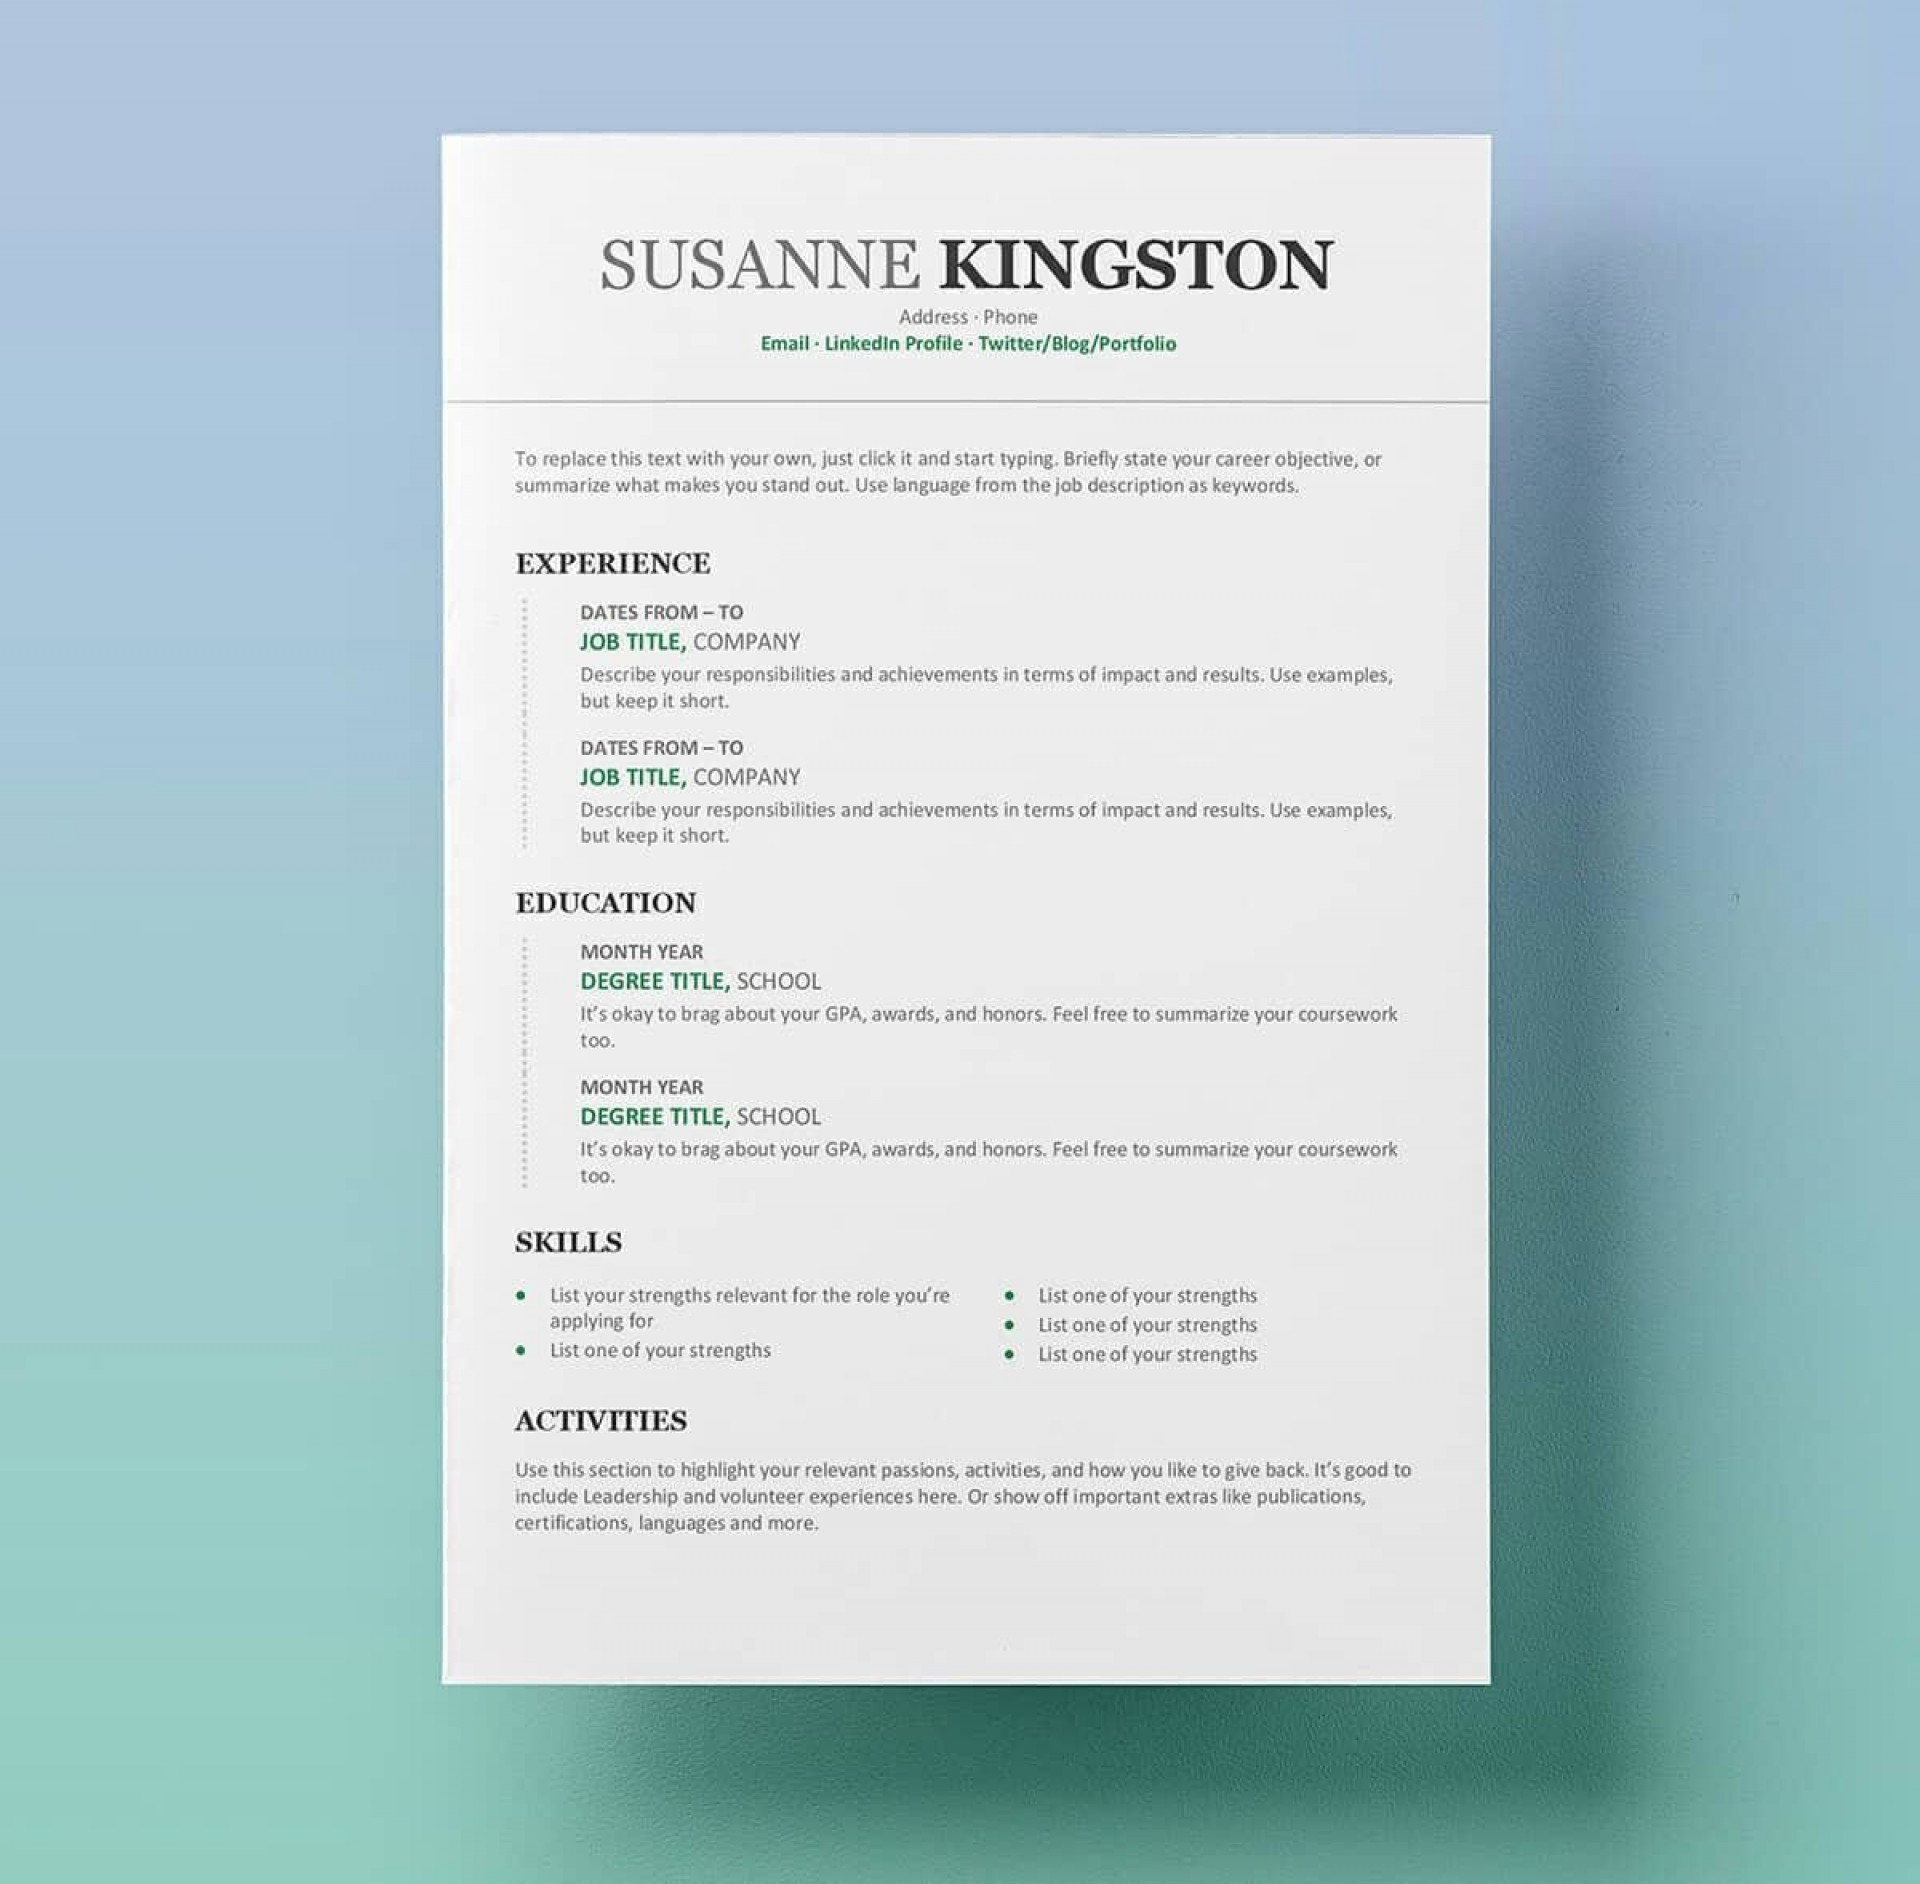 005 Imposing Free Resume Template Microsoft Word Example  2007 Eye Catching Download 20101920